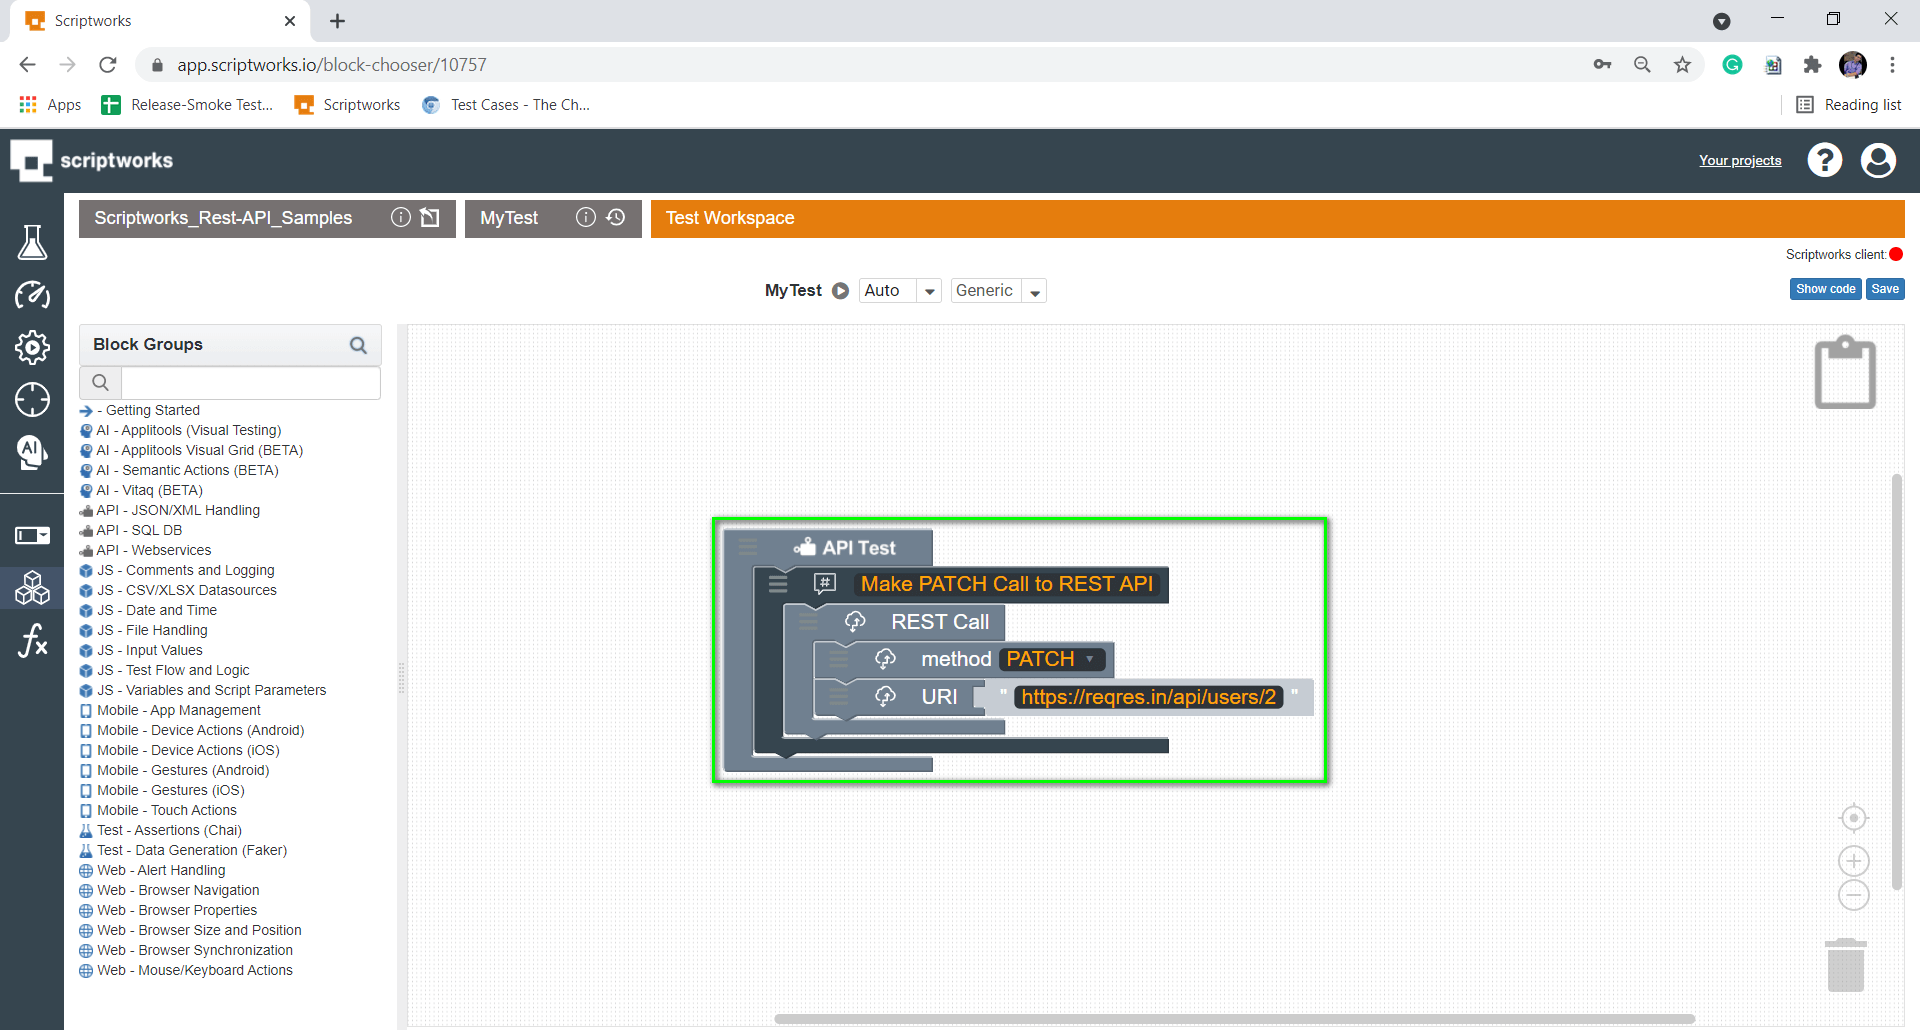 URL needs to enter in URI Block